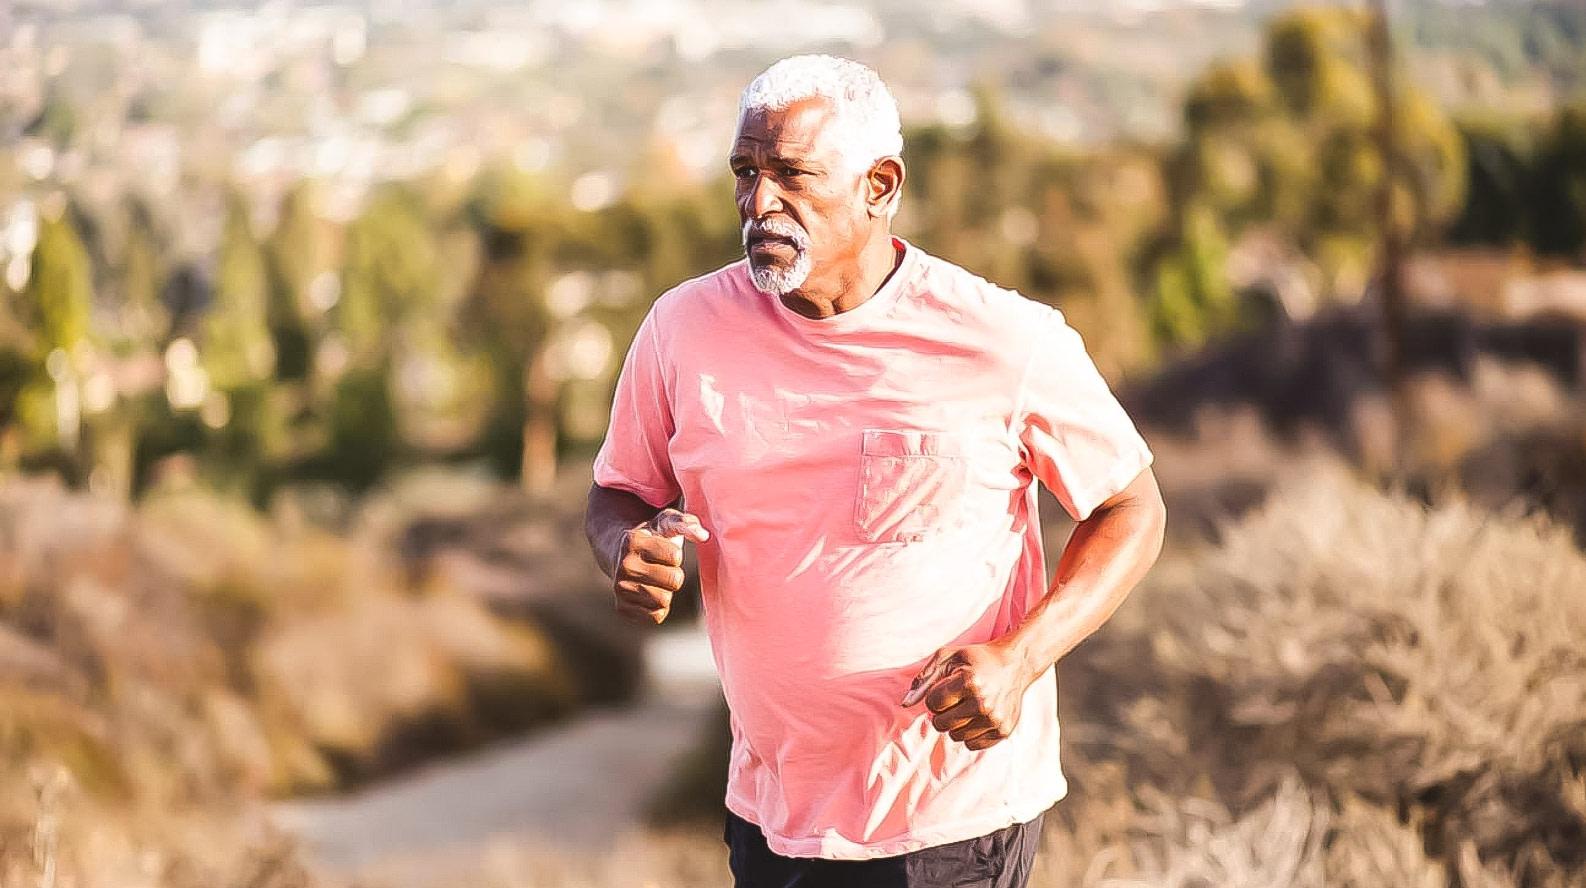 Ageless male running